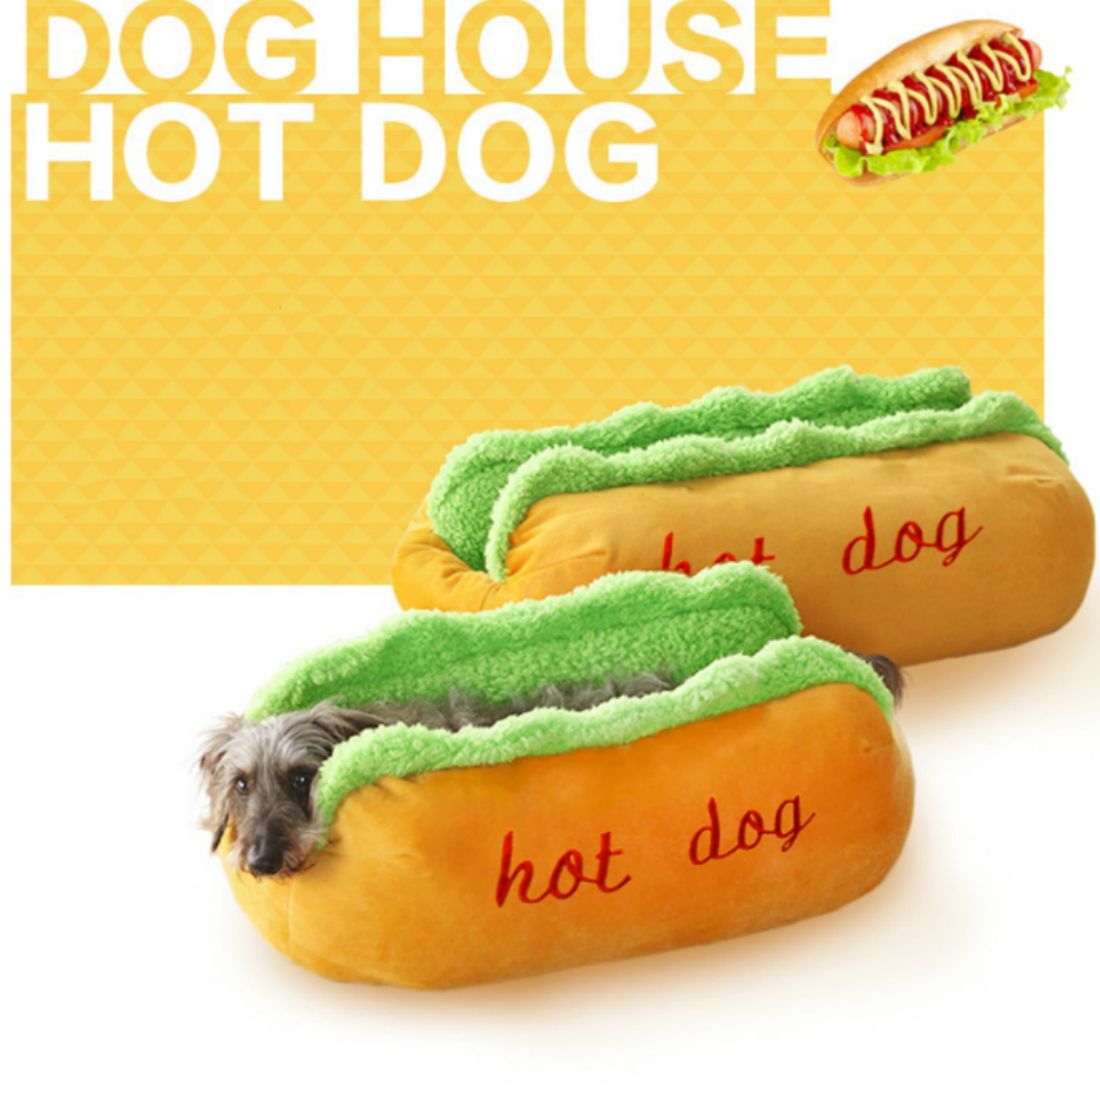 Hot Dog chien lits amovible doux tapis Pet canapé mignon lits pour chiot confortable litière chat couchage coussin Chihuahua Teddy nid chenil